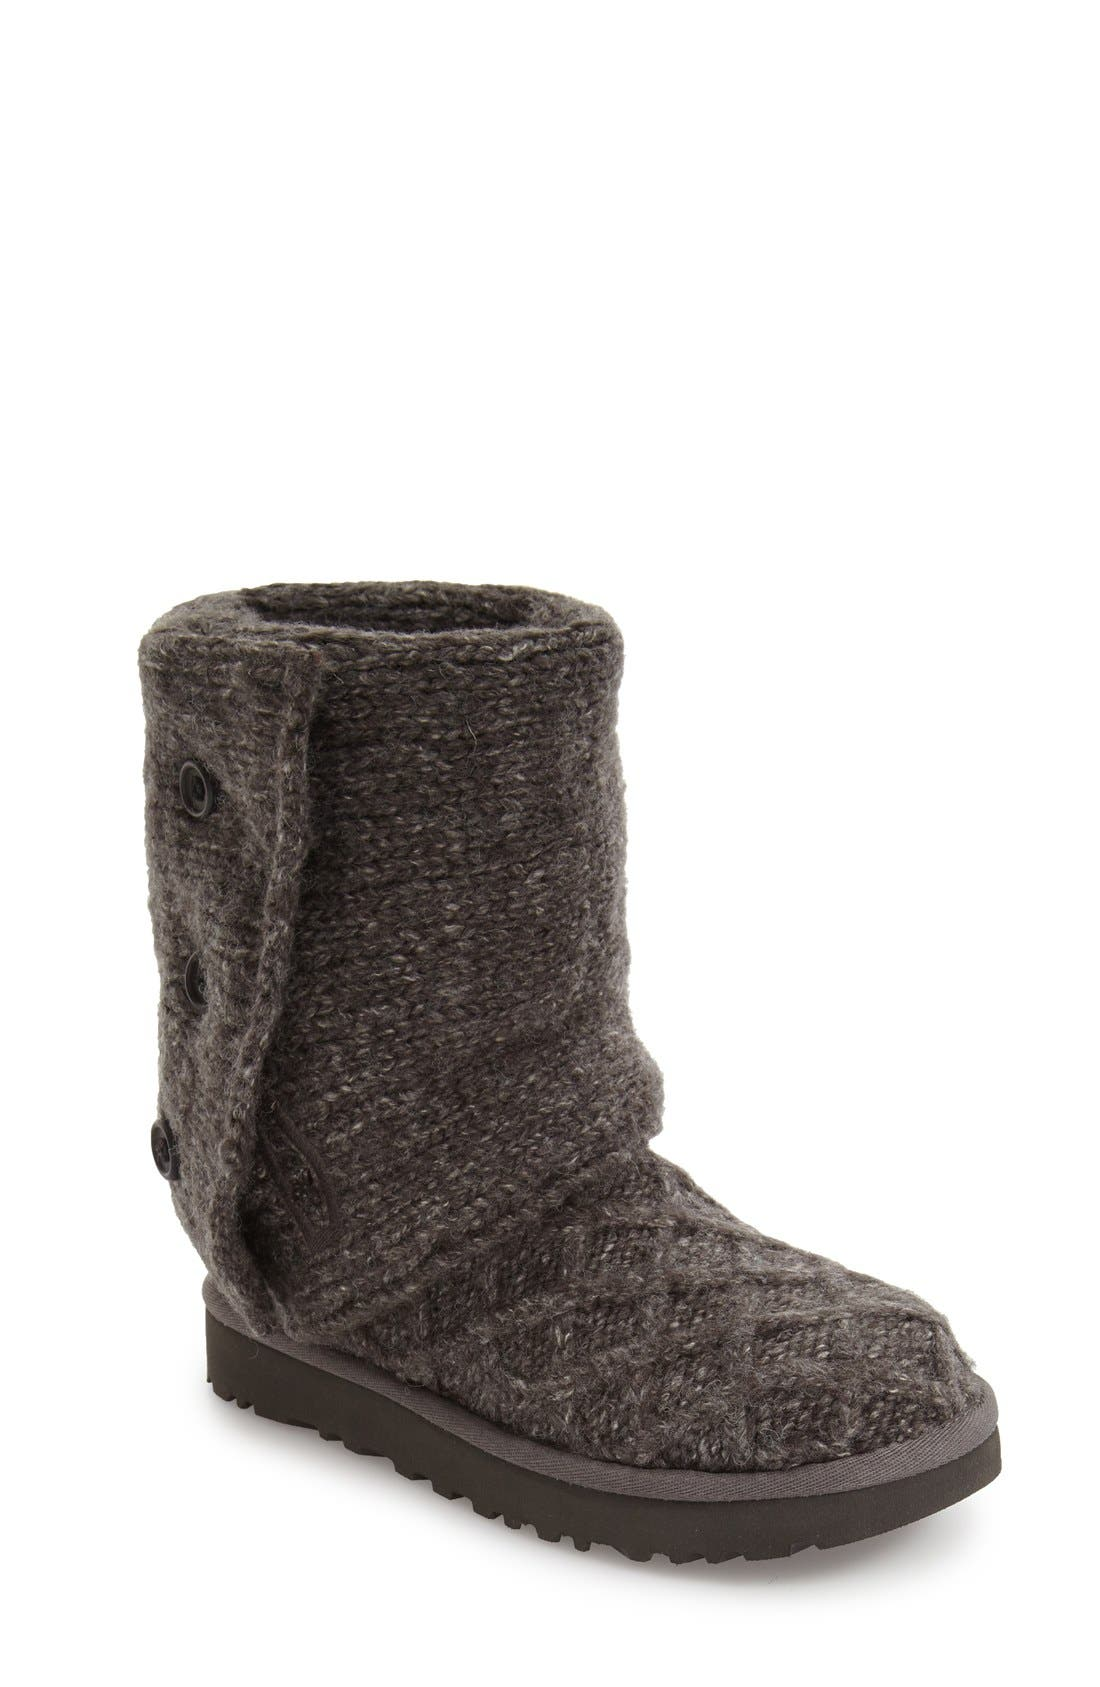 Main Image - UGG® Lattice Cardy II Boot (Women)